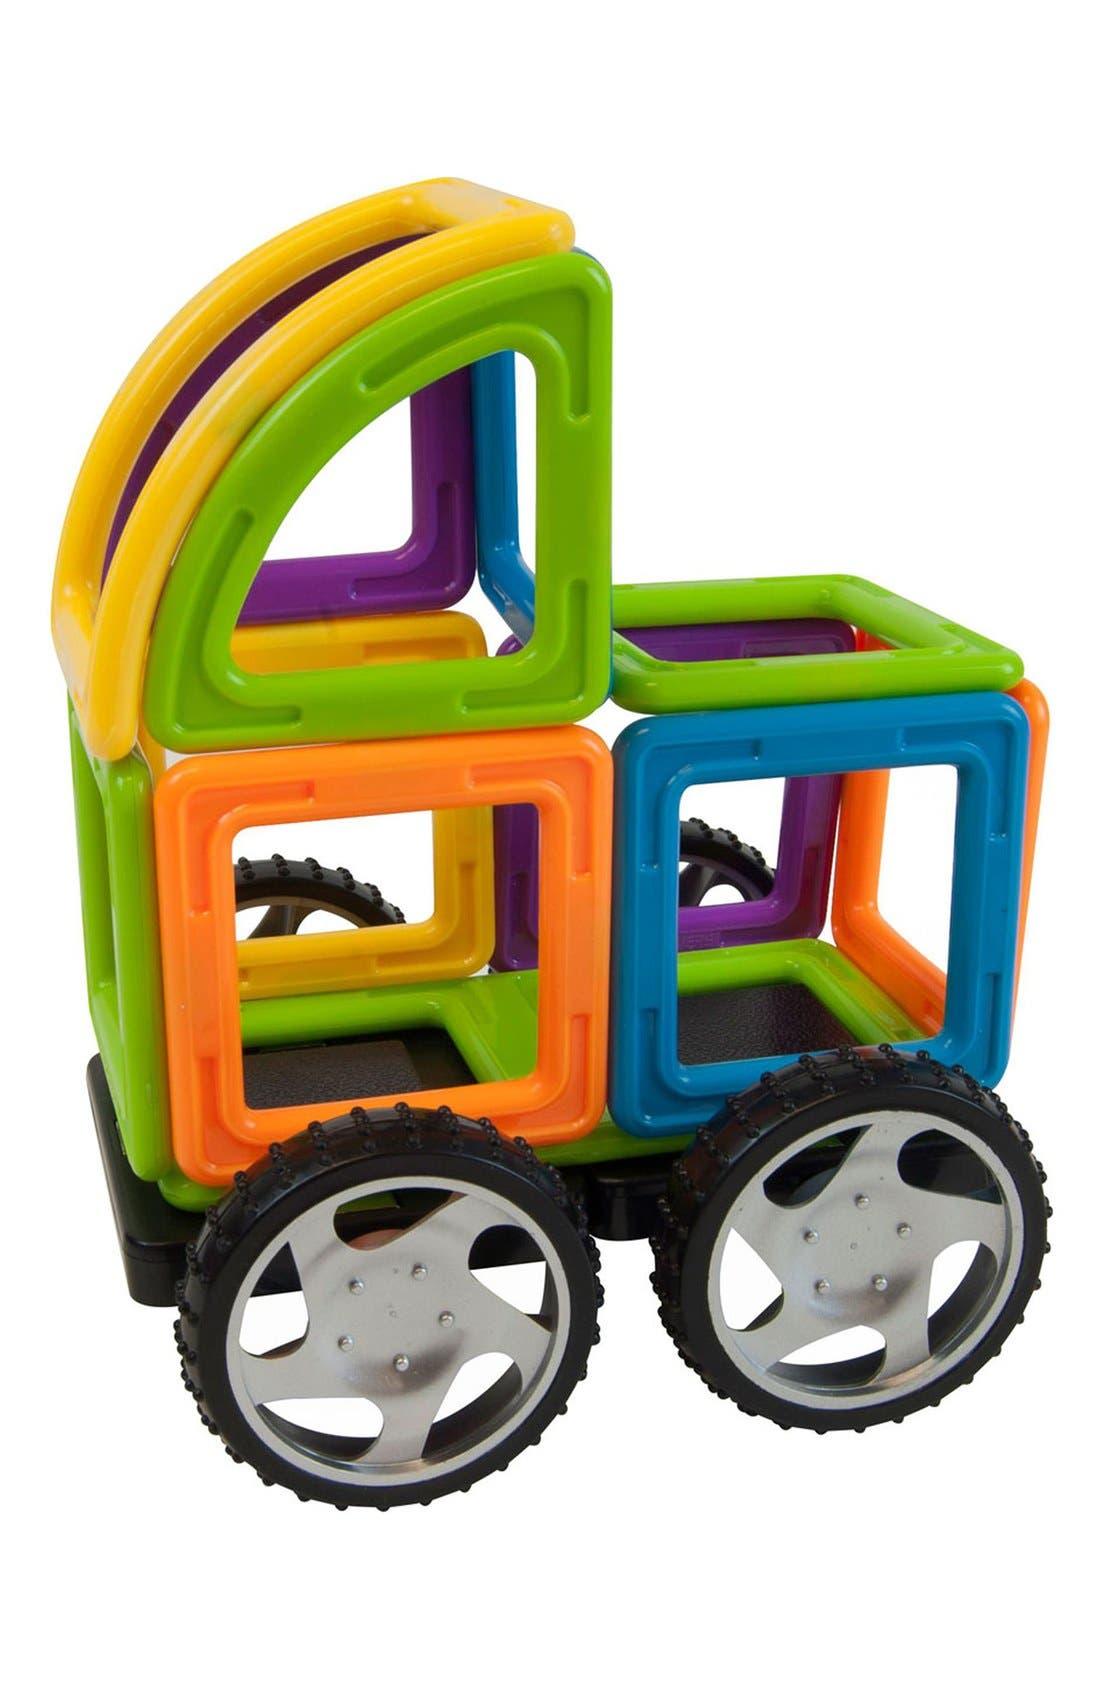 'Vehicle - WOW' Magnetic 3D Construction Set,                             Alternate thumbnail 8, color,                             Opaque Rainbow